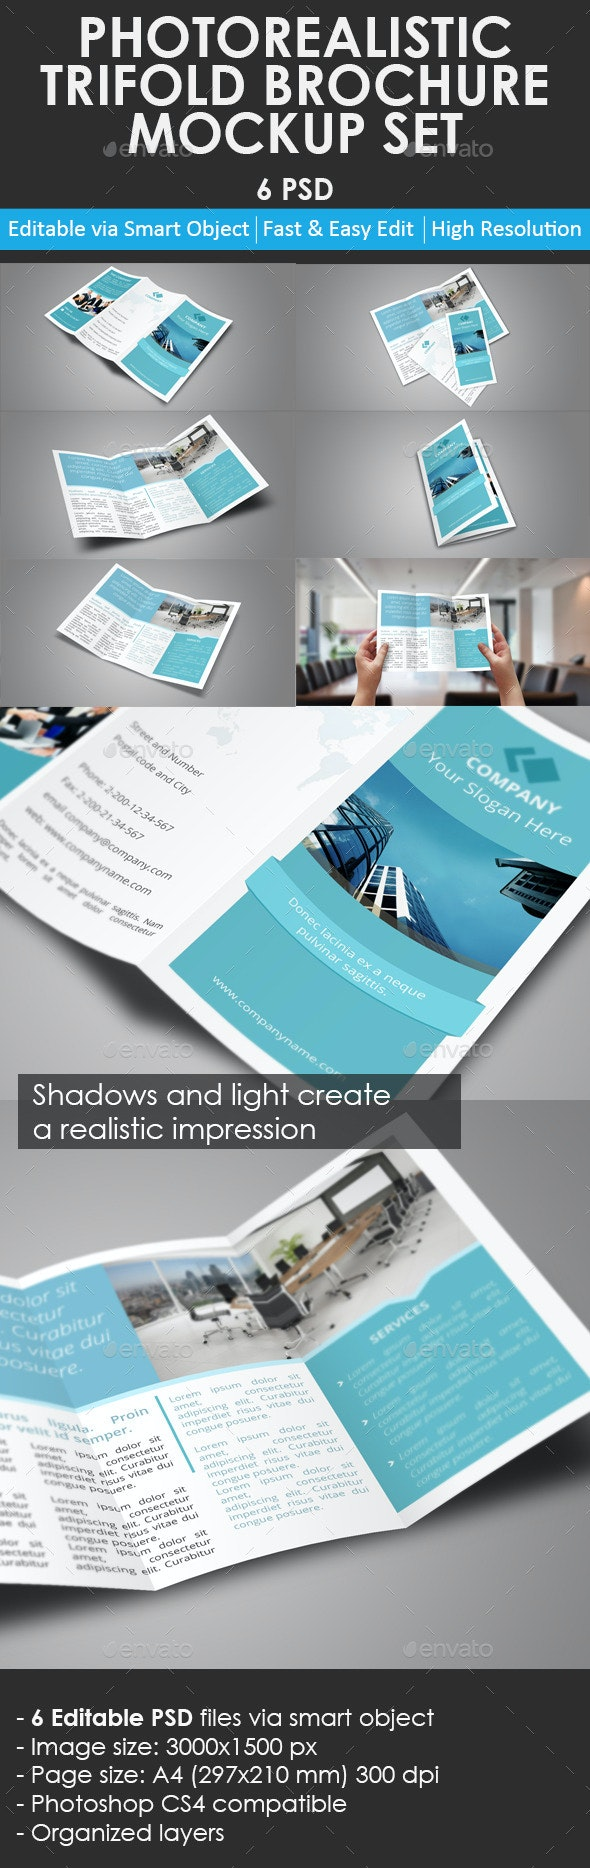 Trifold Brochure Mockup Set - Product Mock-Ups Graphics